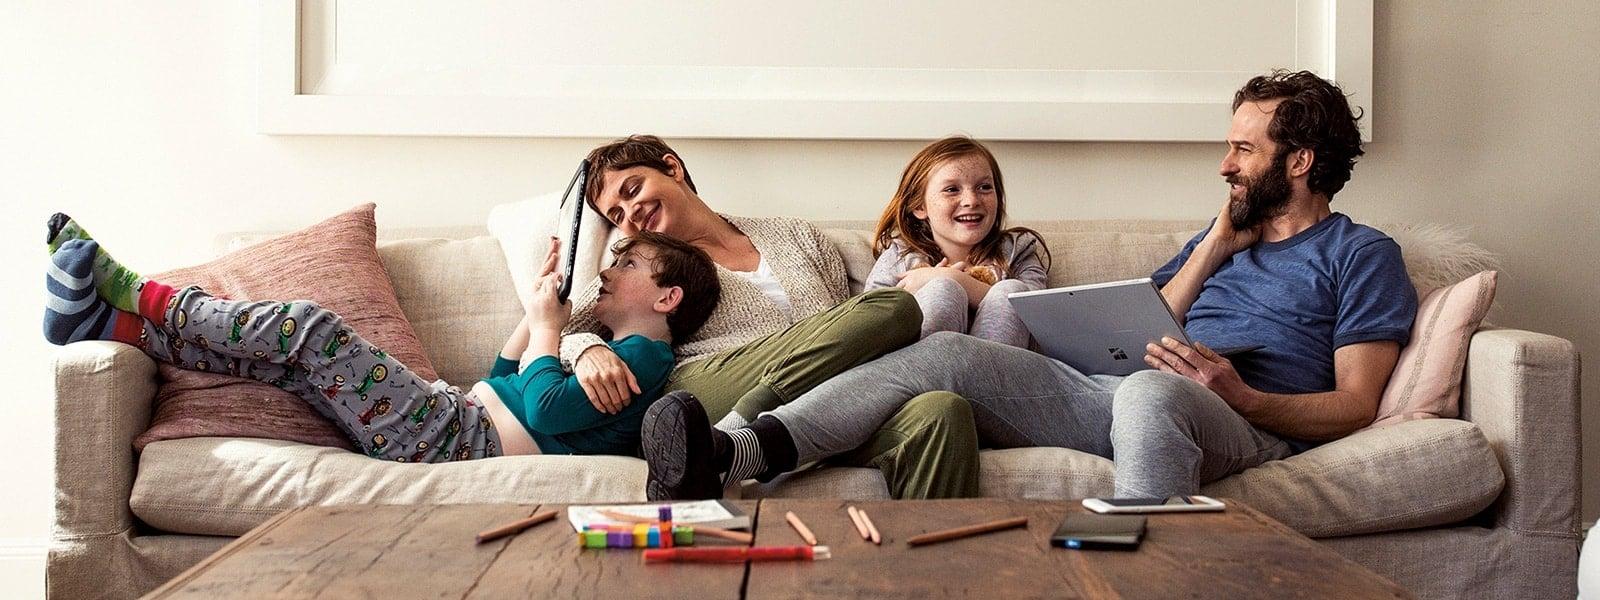 Familia tumbada en un sofá